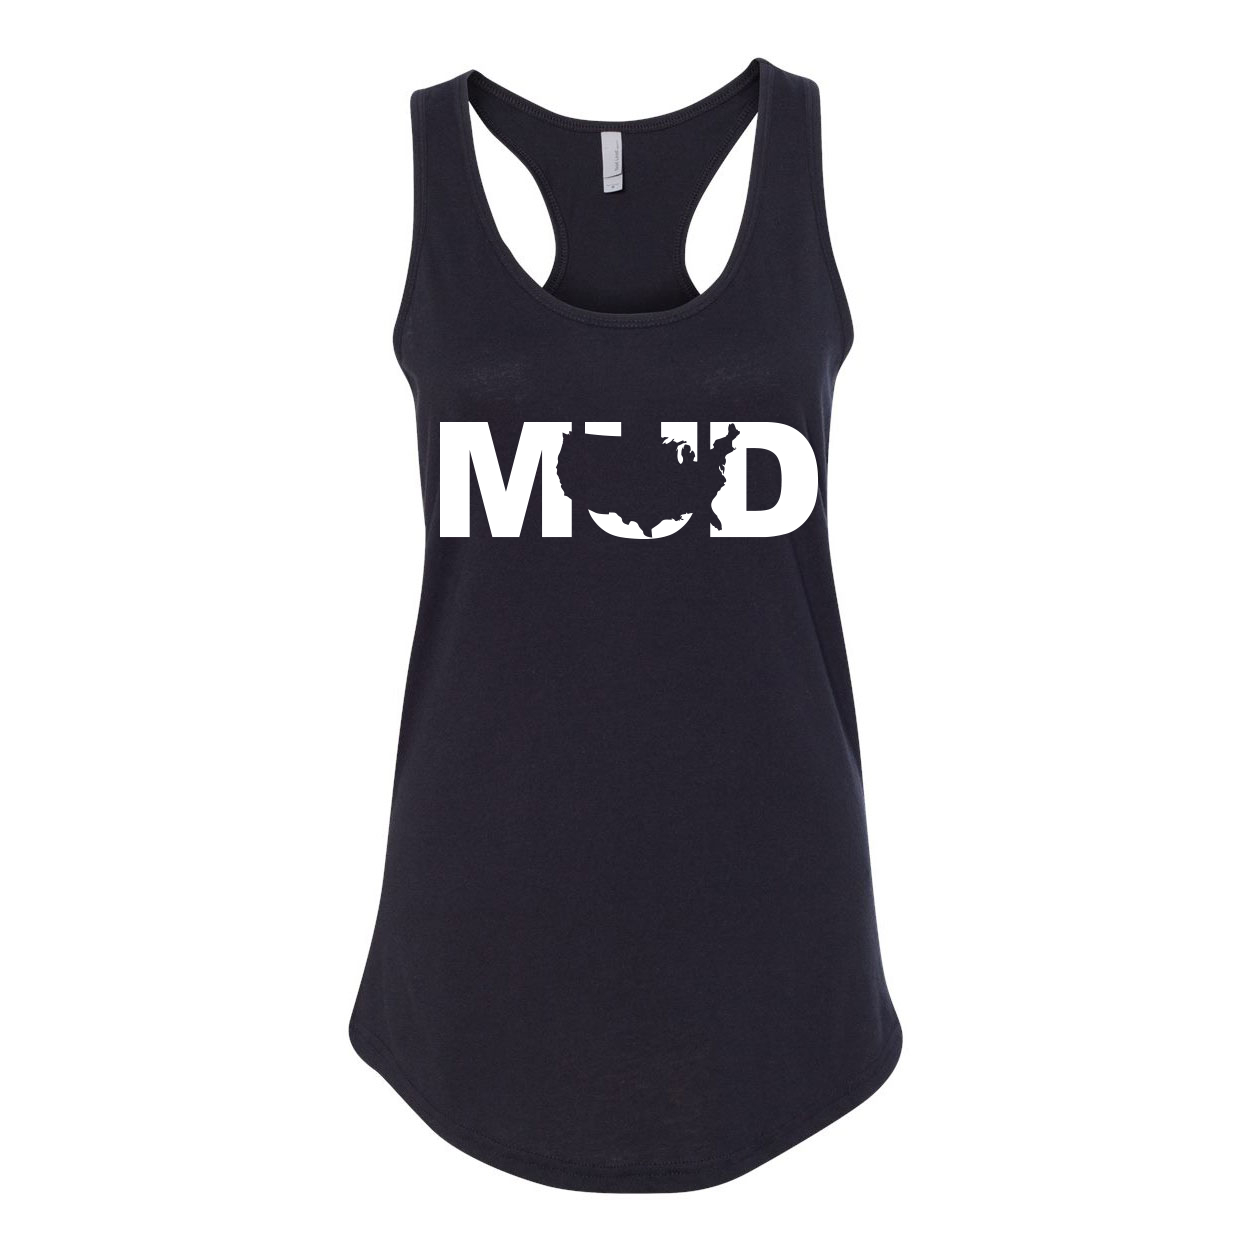 Mud United States Classic Women's Racerback Tank Top Black (White Logo)